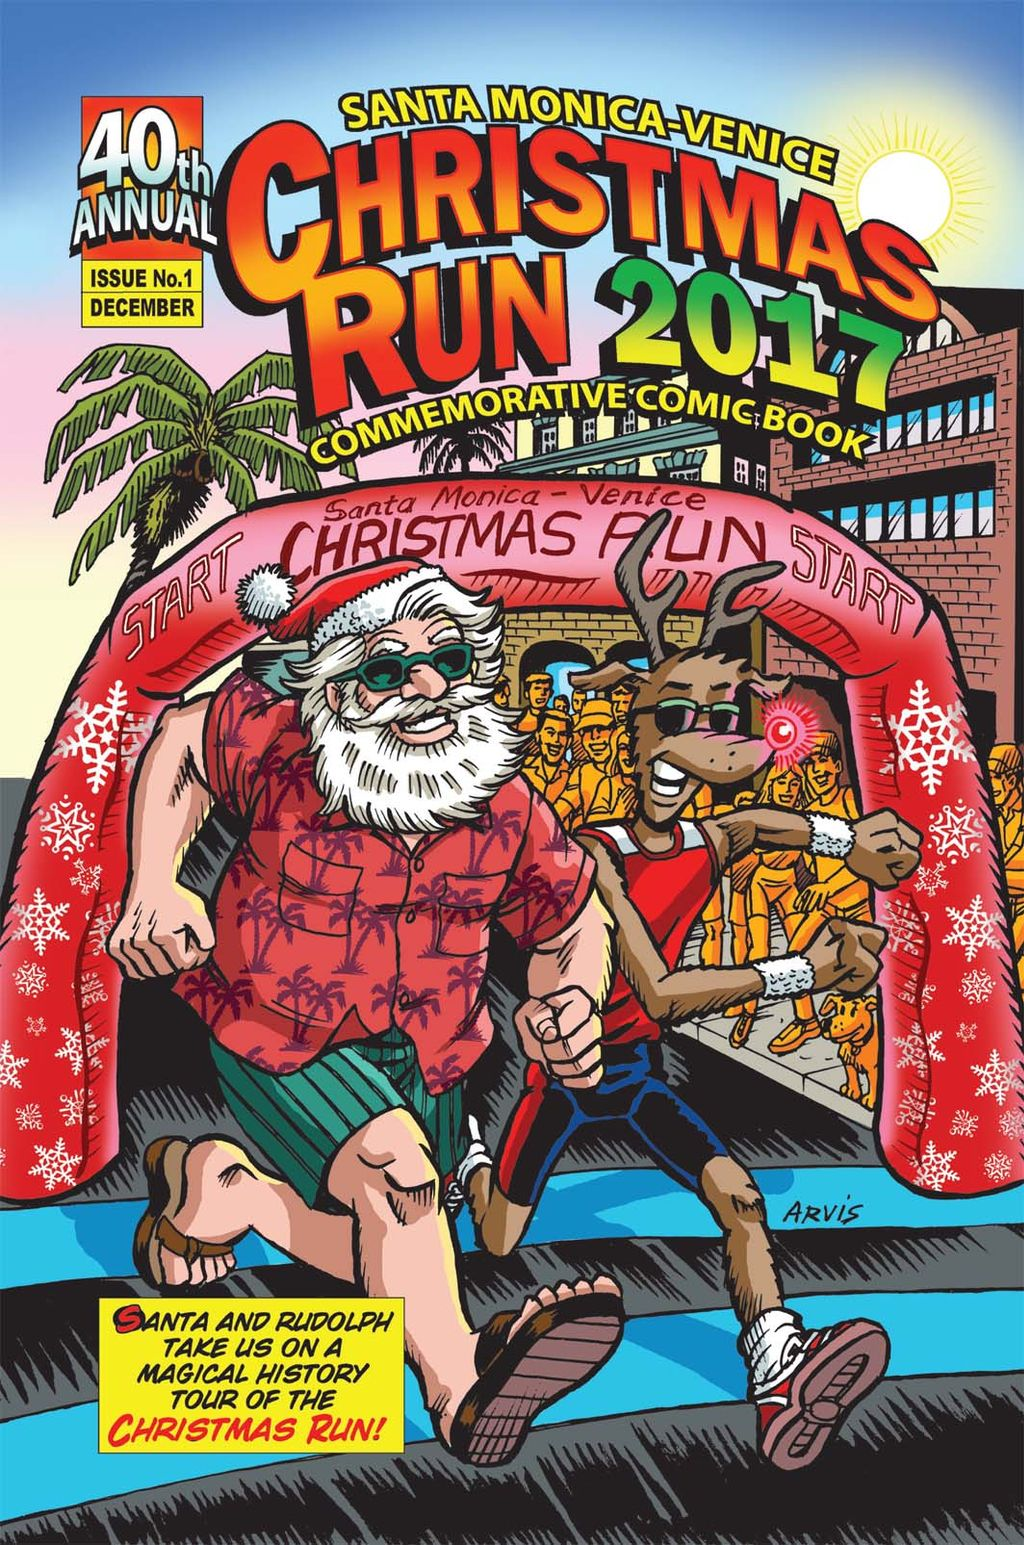 Santa Monica Venice Christmas Run